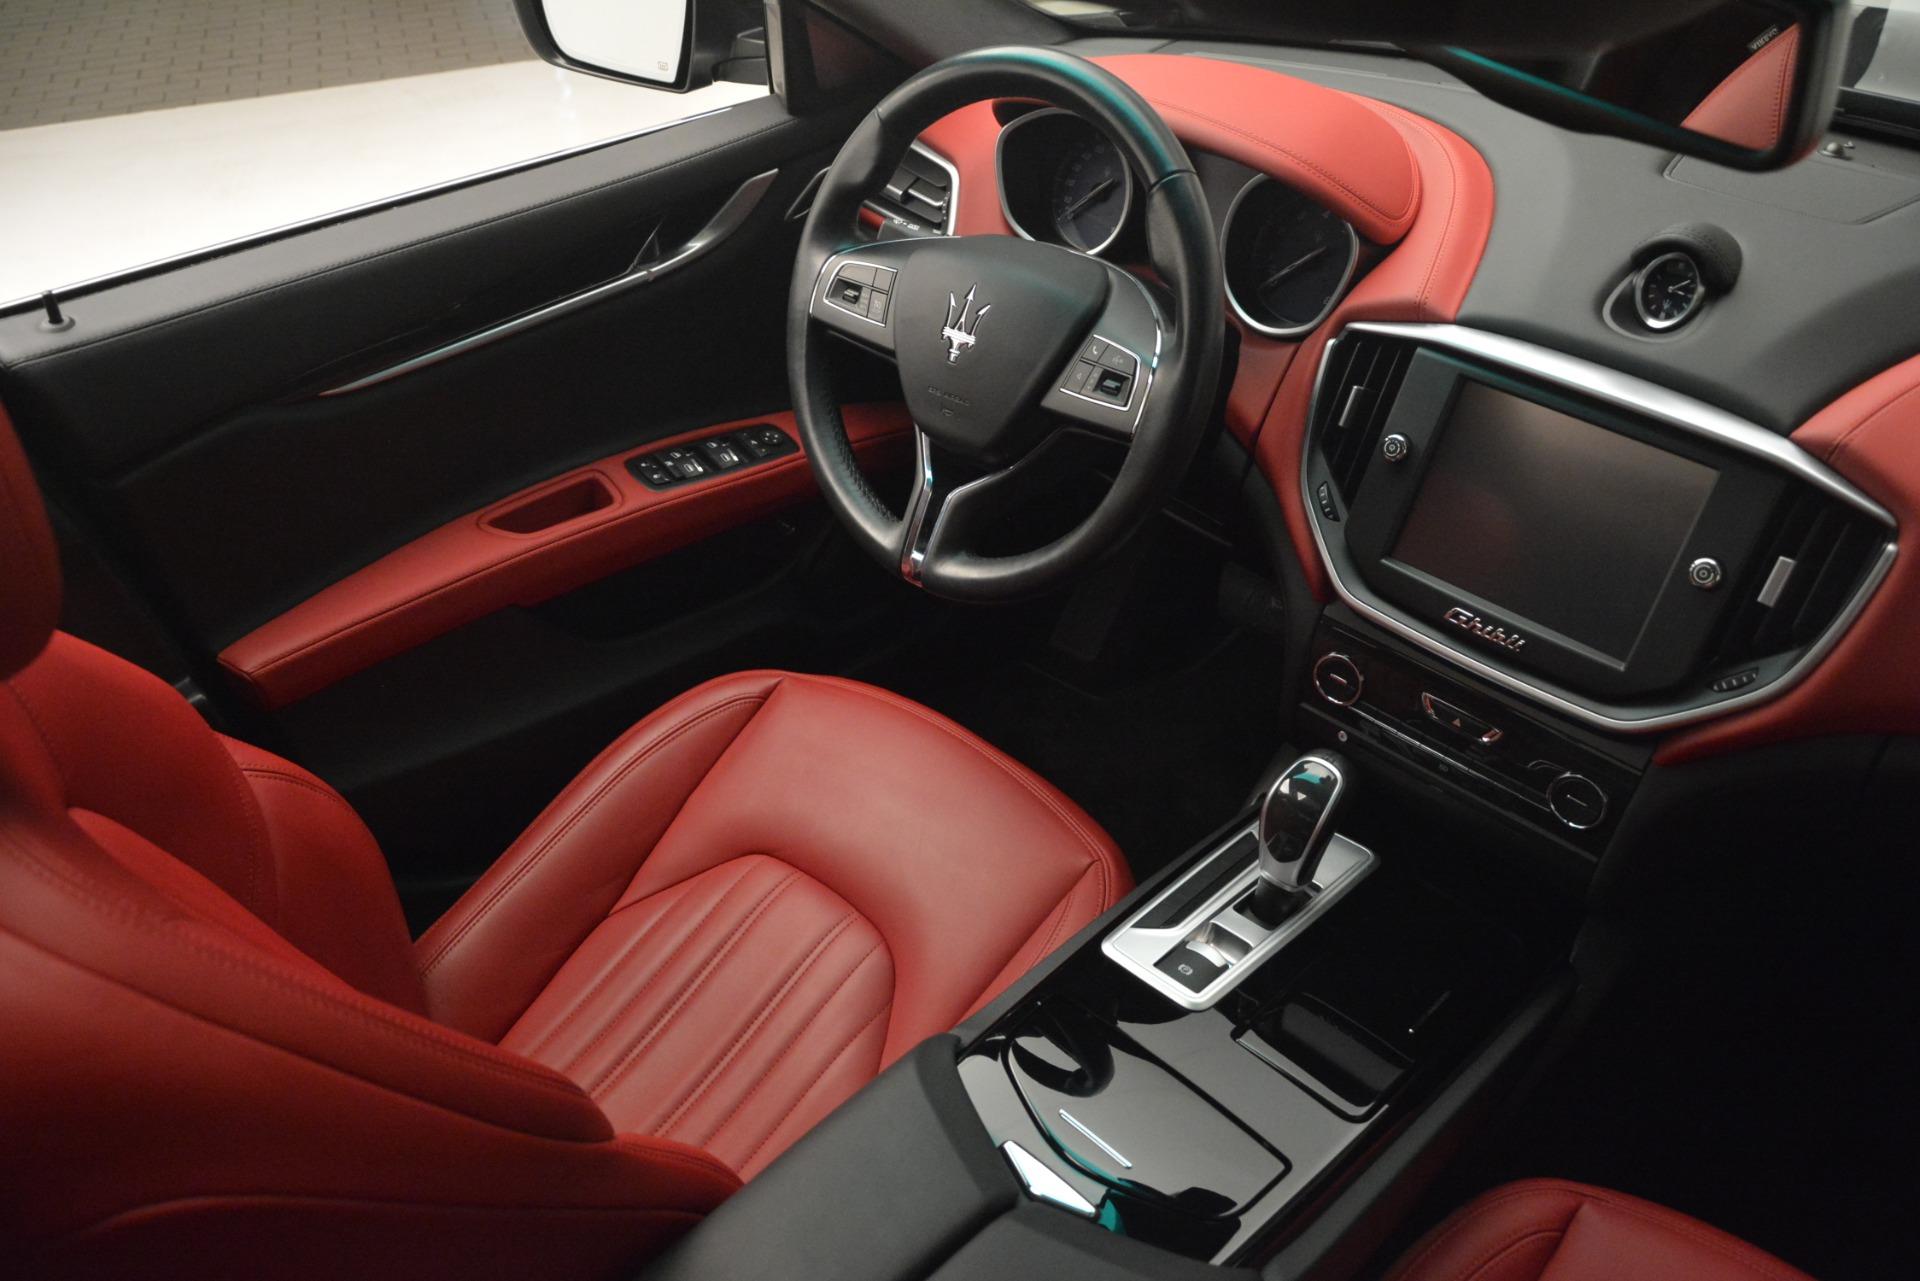 Used 2016 Maserati Ghibli S Q4 For Sale In Greenwich, CT 2945_p18